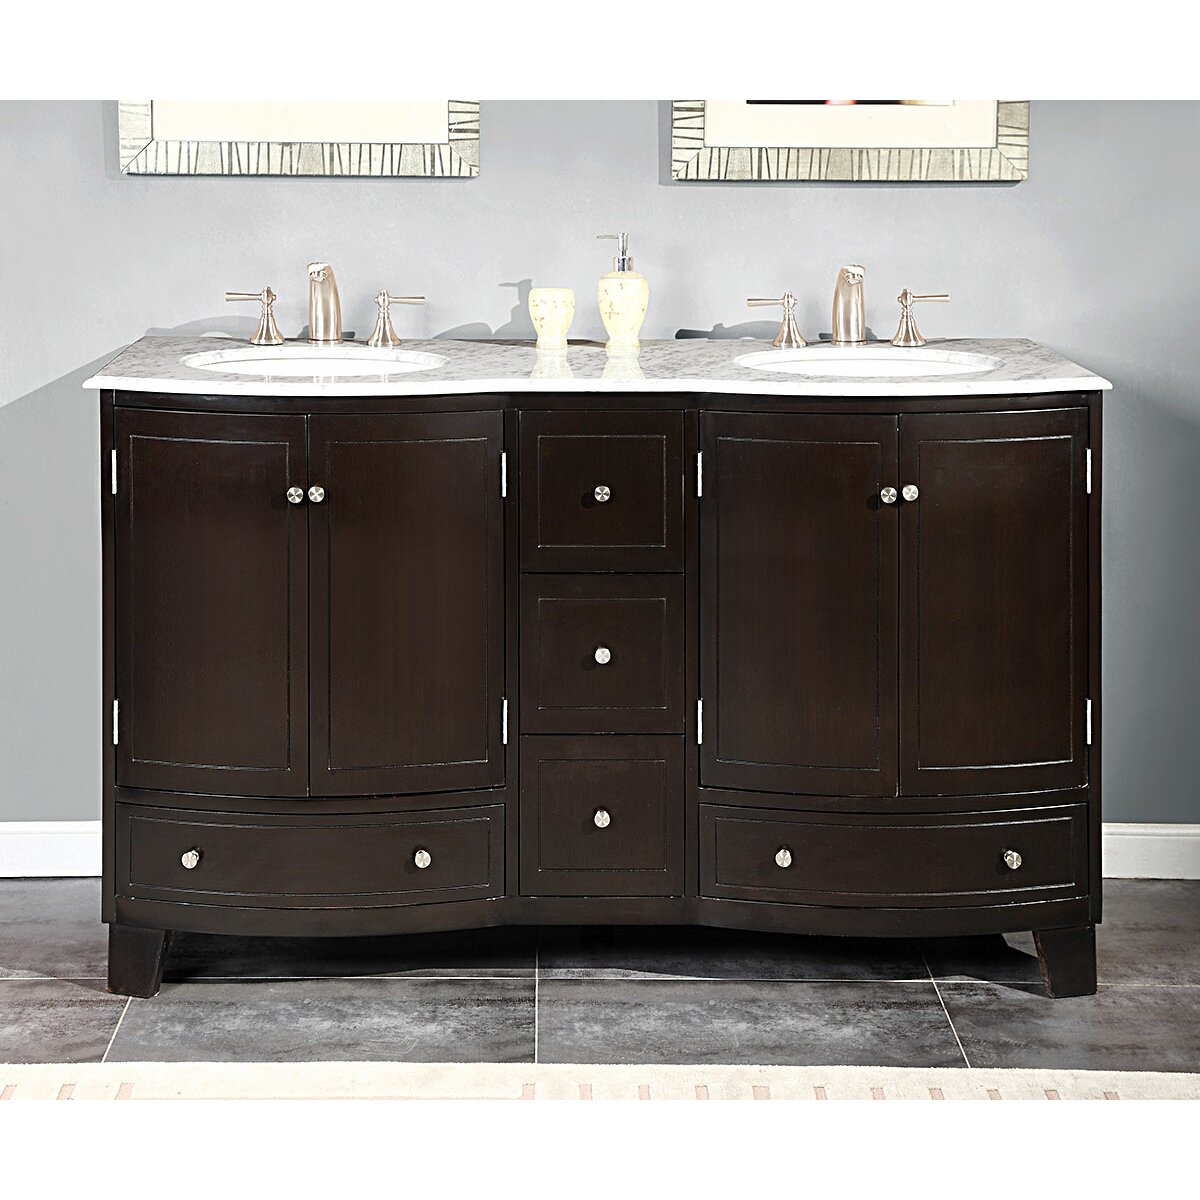 Silkroad exclusive naomi 60 double bathroom vanity set for Bathroom 60 double sink vanity